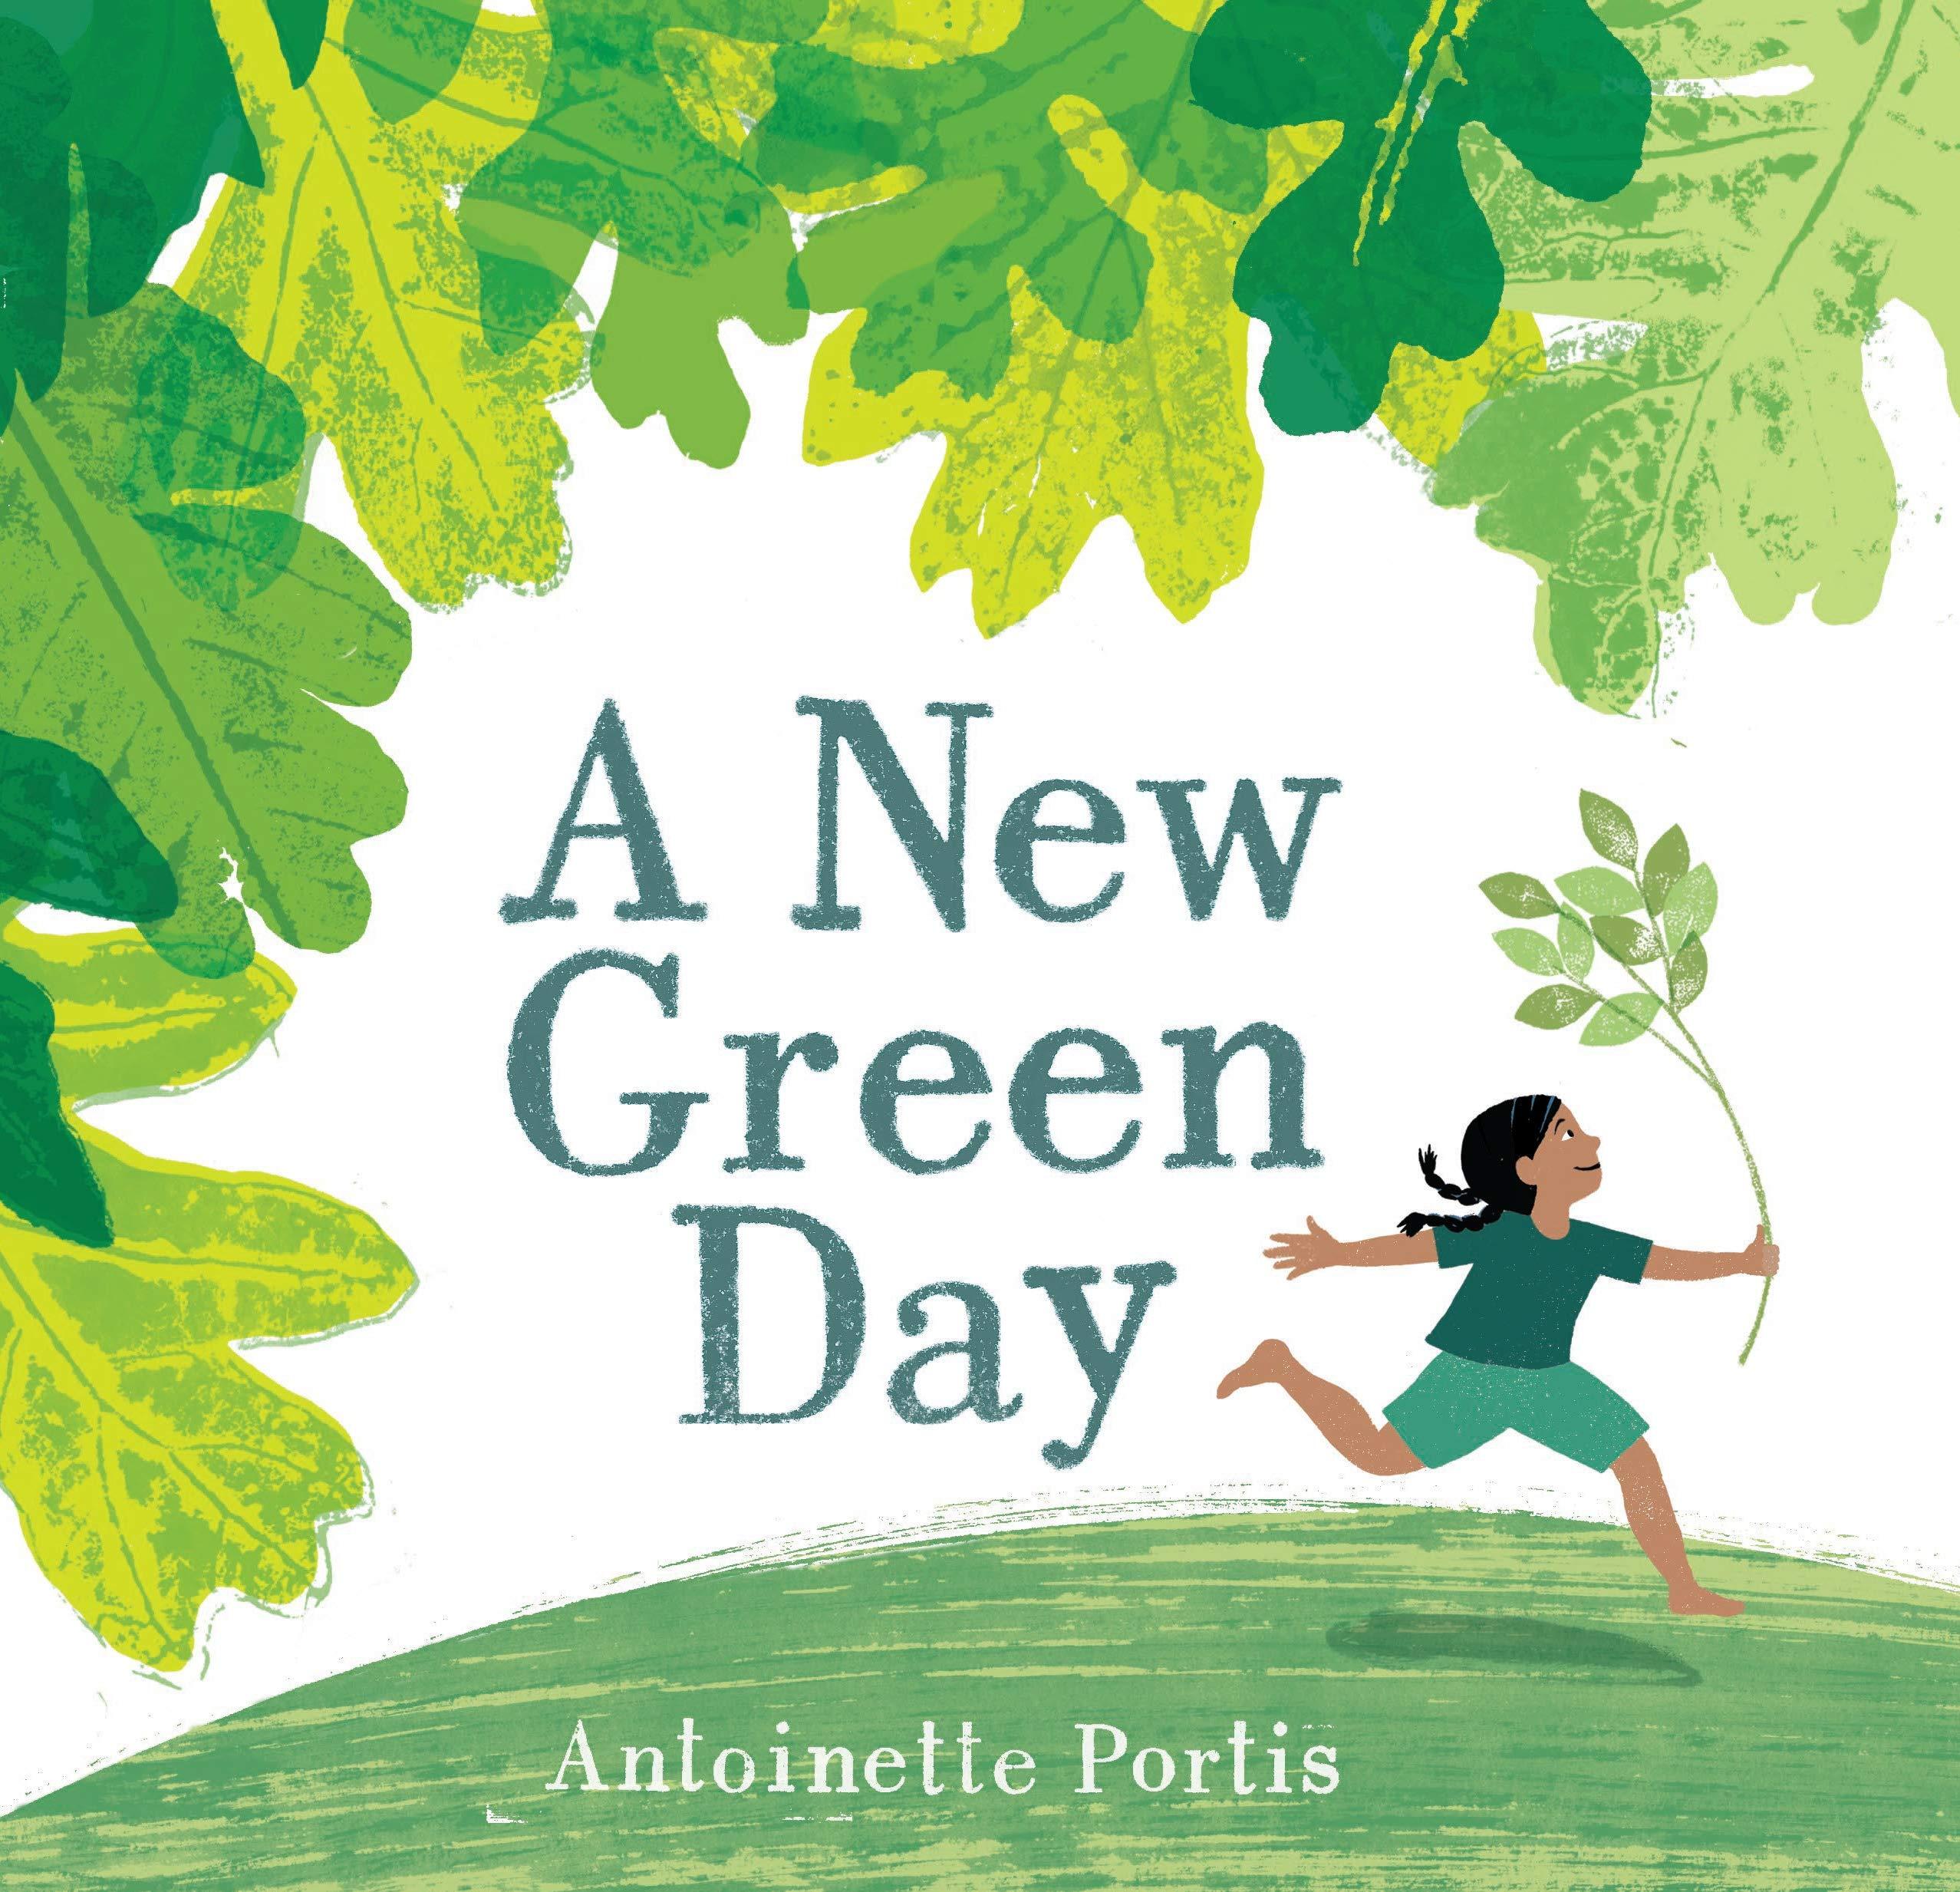 Amazon.com: A New Green Day (9780823444885): Portis, Antoinette: Books